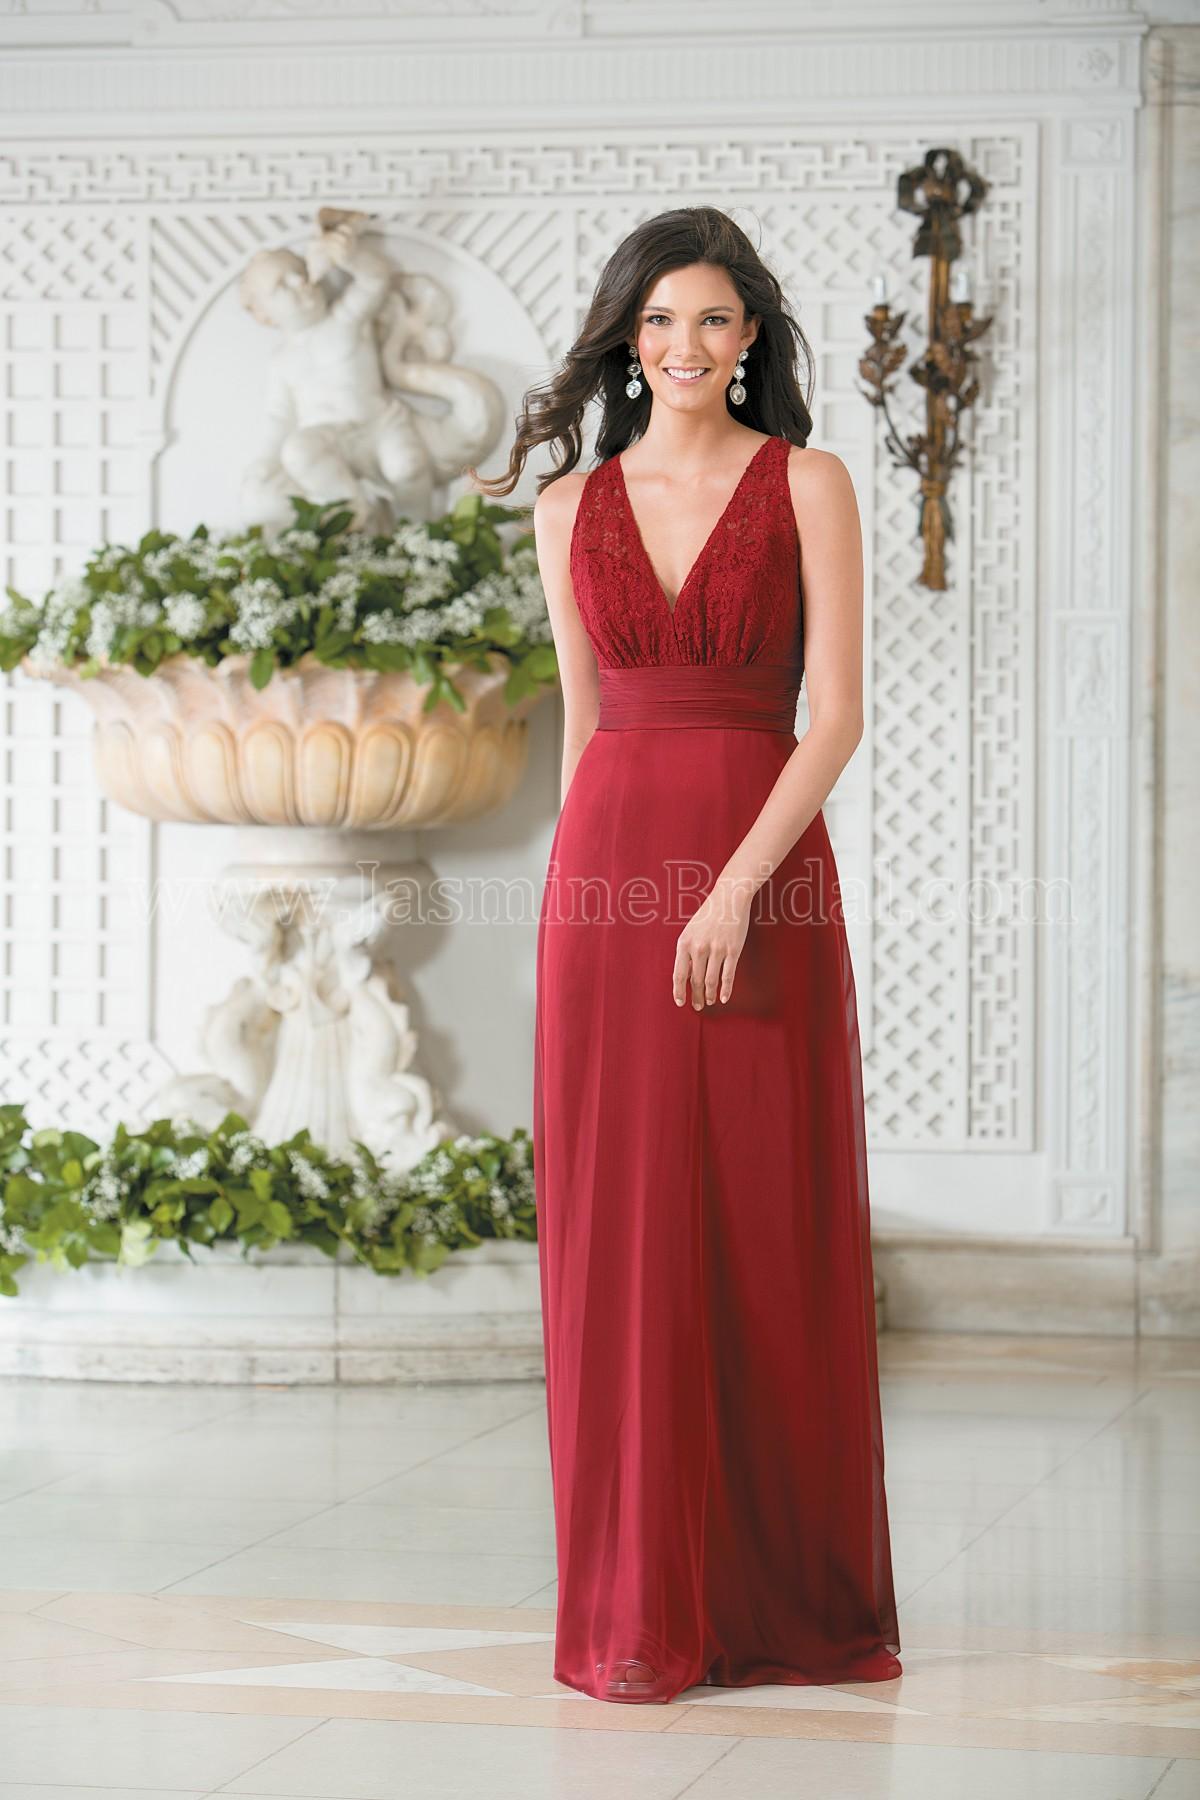 L174011 Long V-neck Lace & Belsoie Tiffany Chiffon Bridesmaid Dress